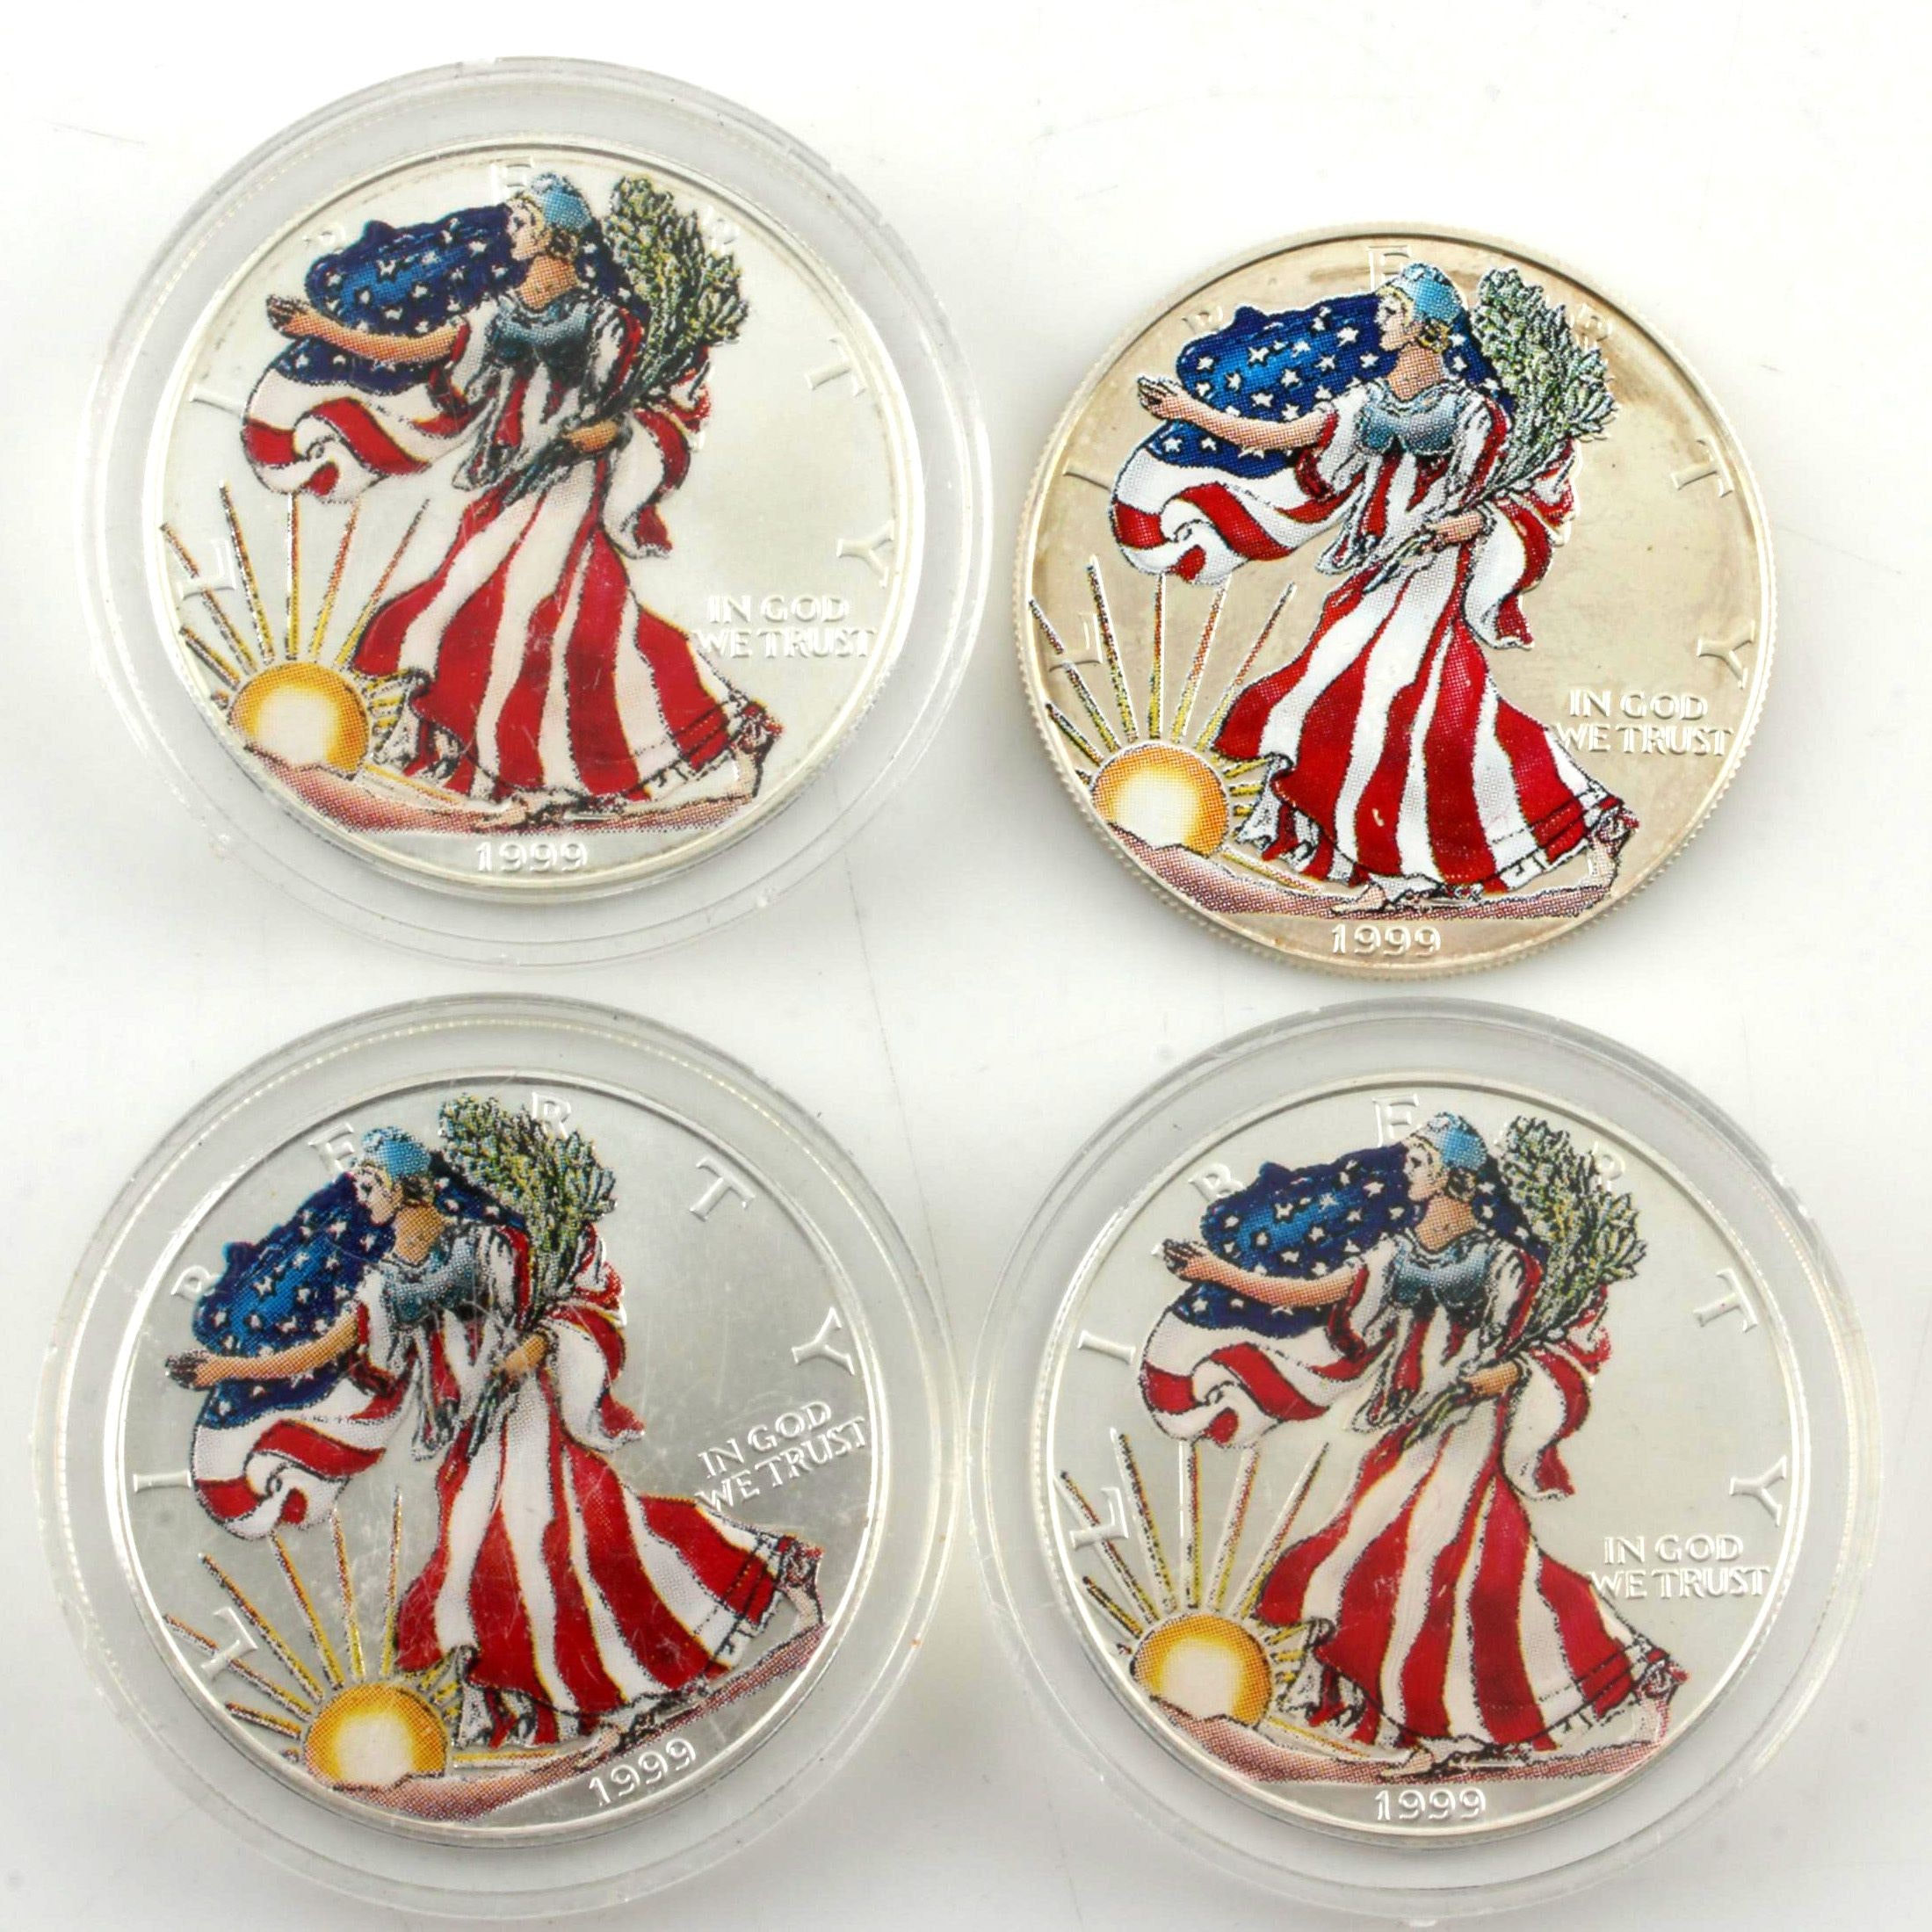 Four Colorized 1999 Walking Liberty Silver Eagle Bullion Coins